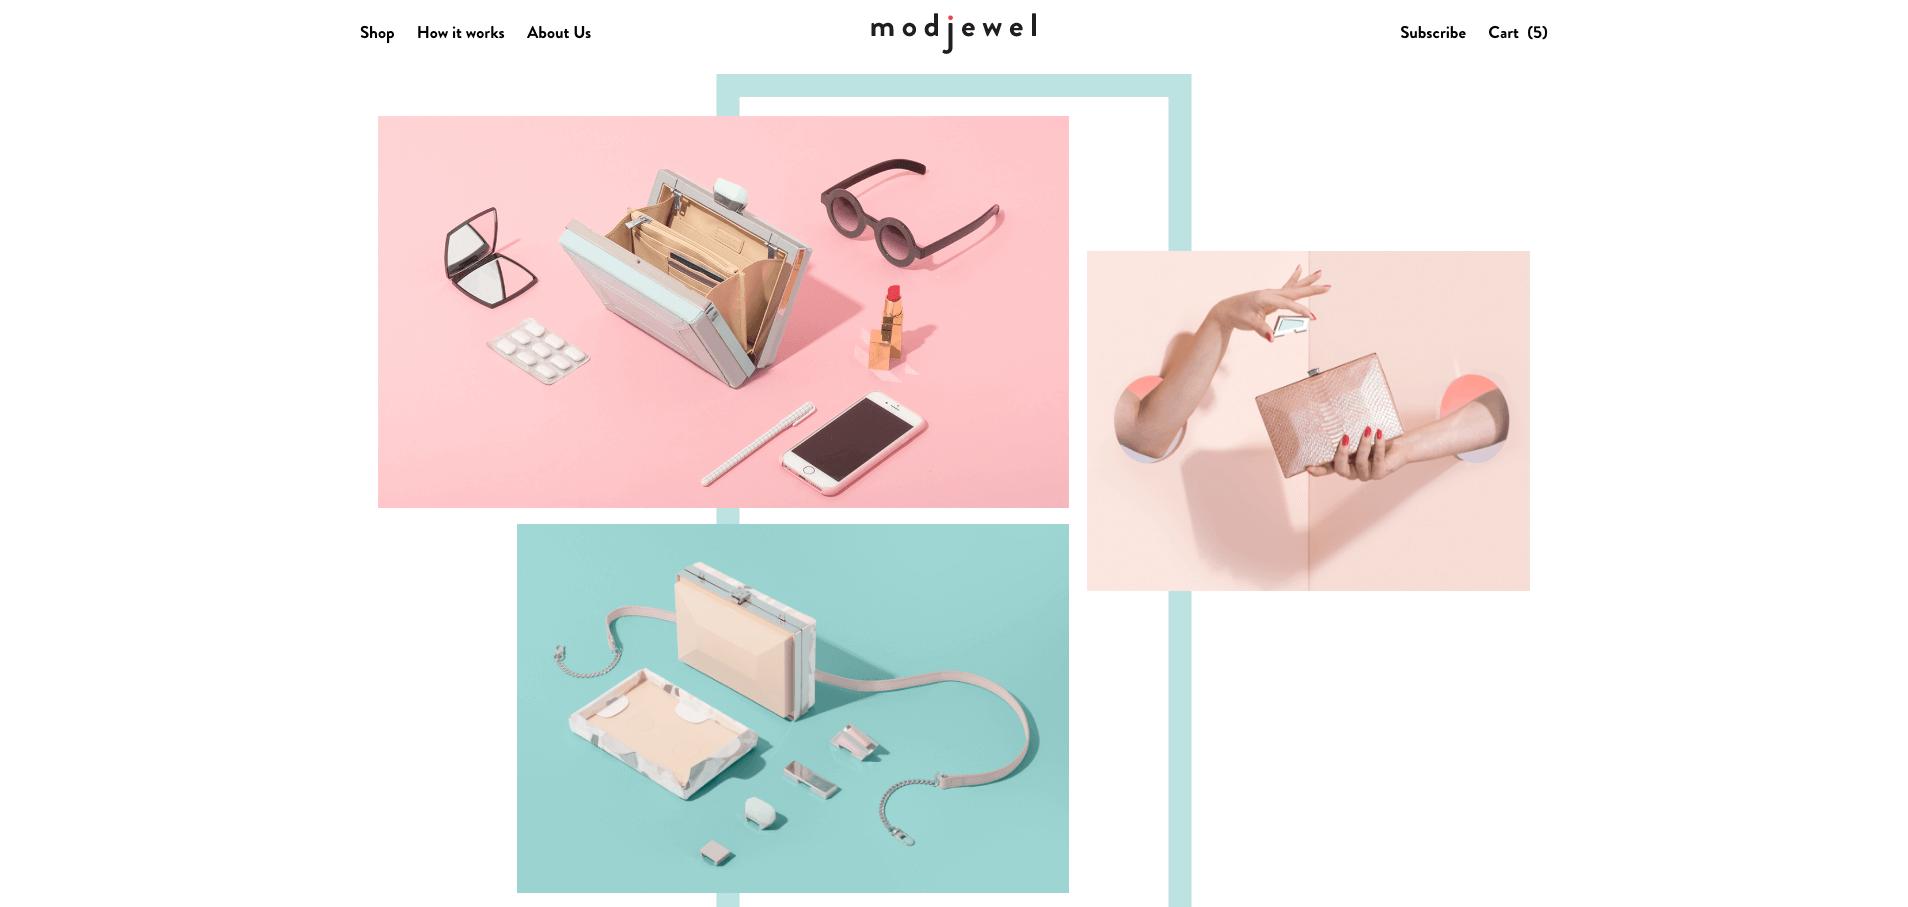 modjewel-snipcart-case-study-site